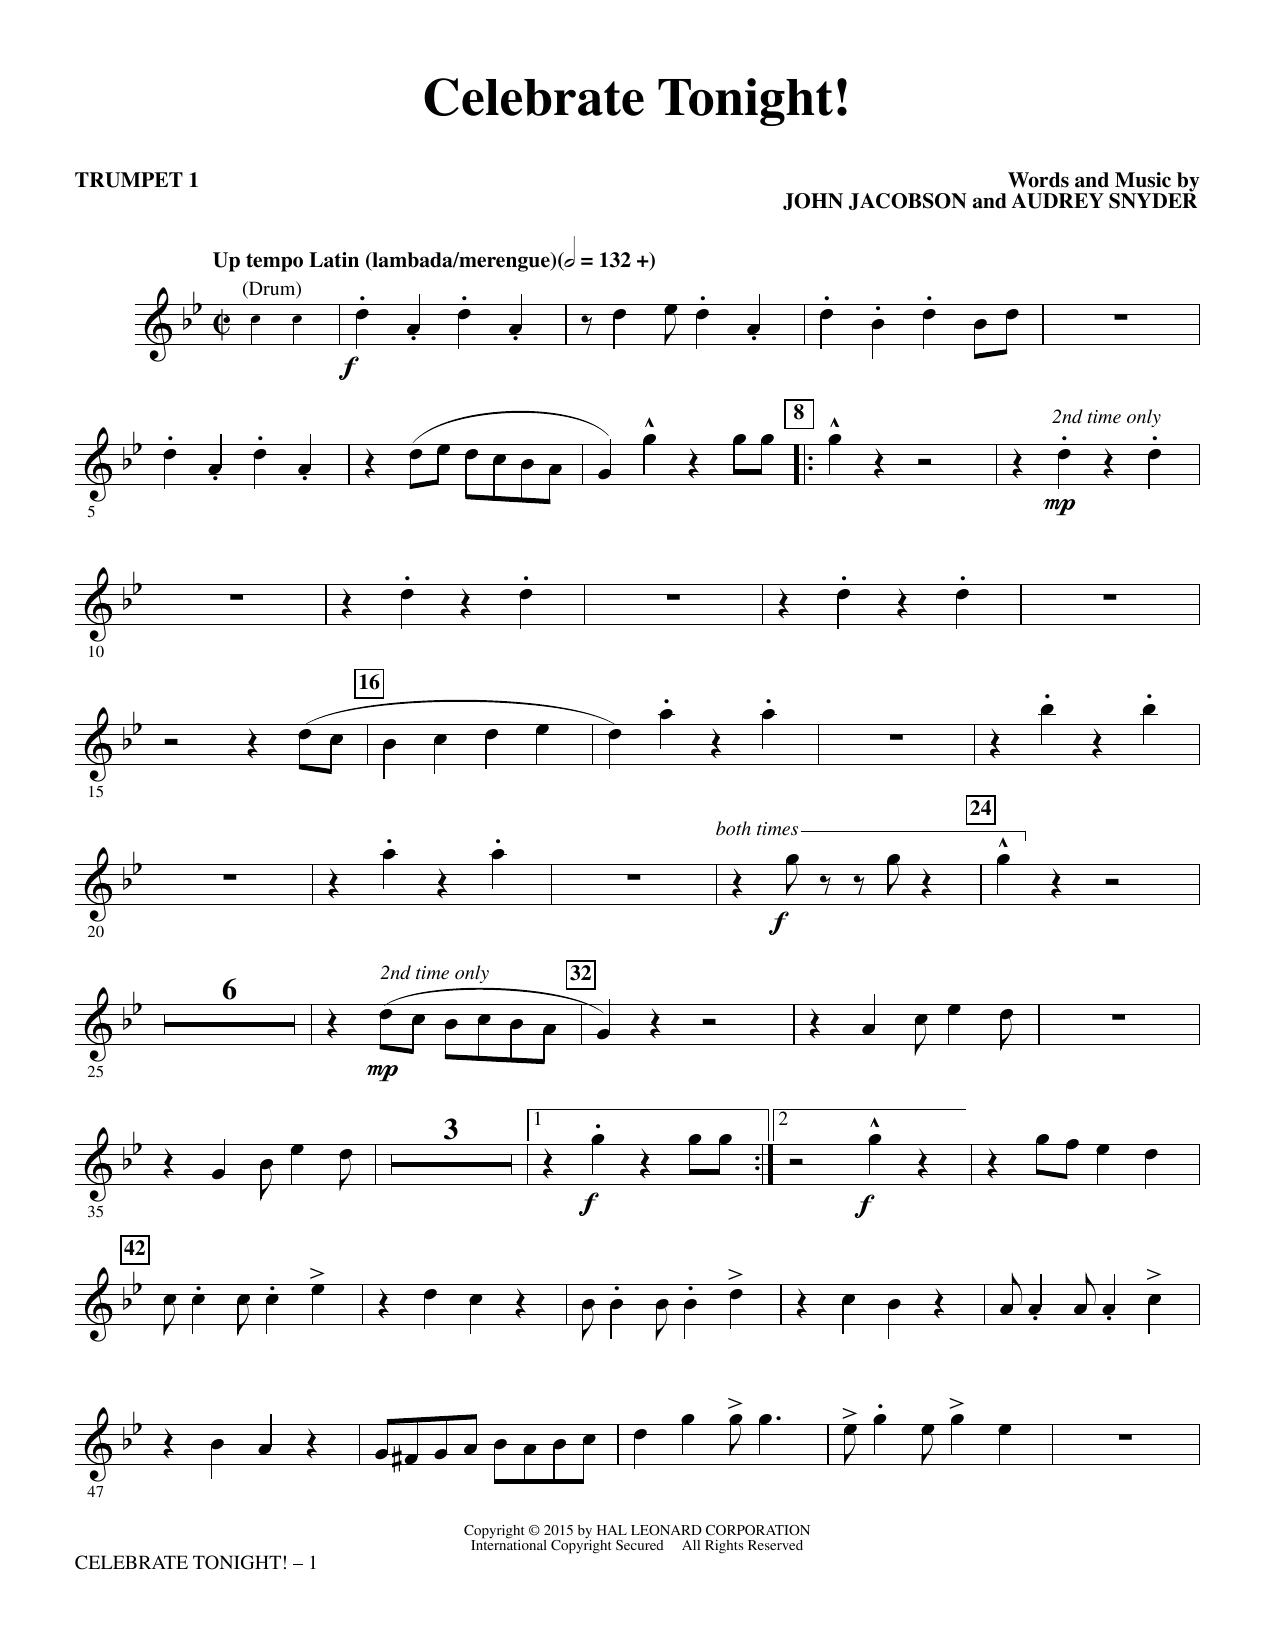 John Jacobson Celebrate Tonight! - Trumpet 1 sheet music notes and chords. Download Printable PDF.